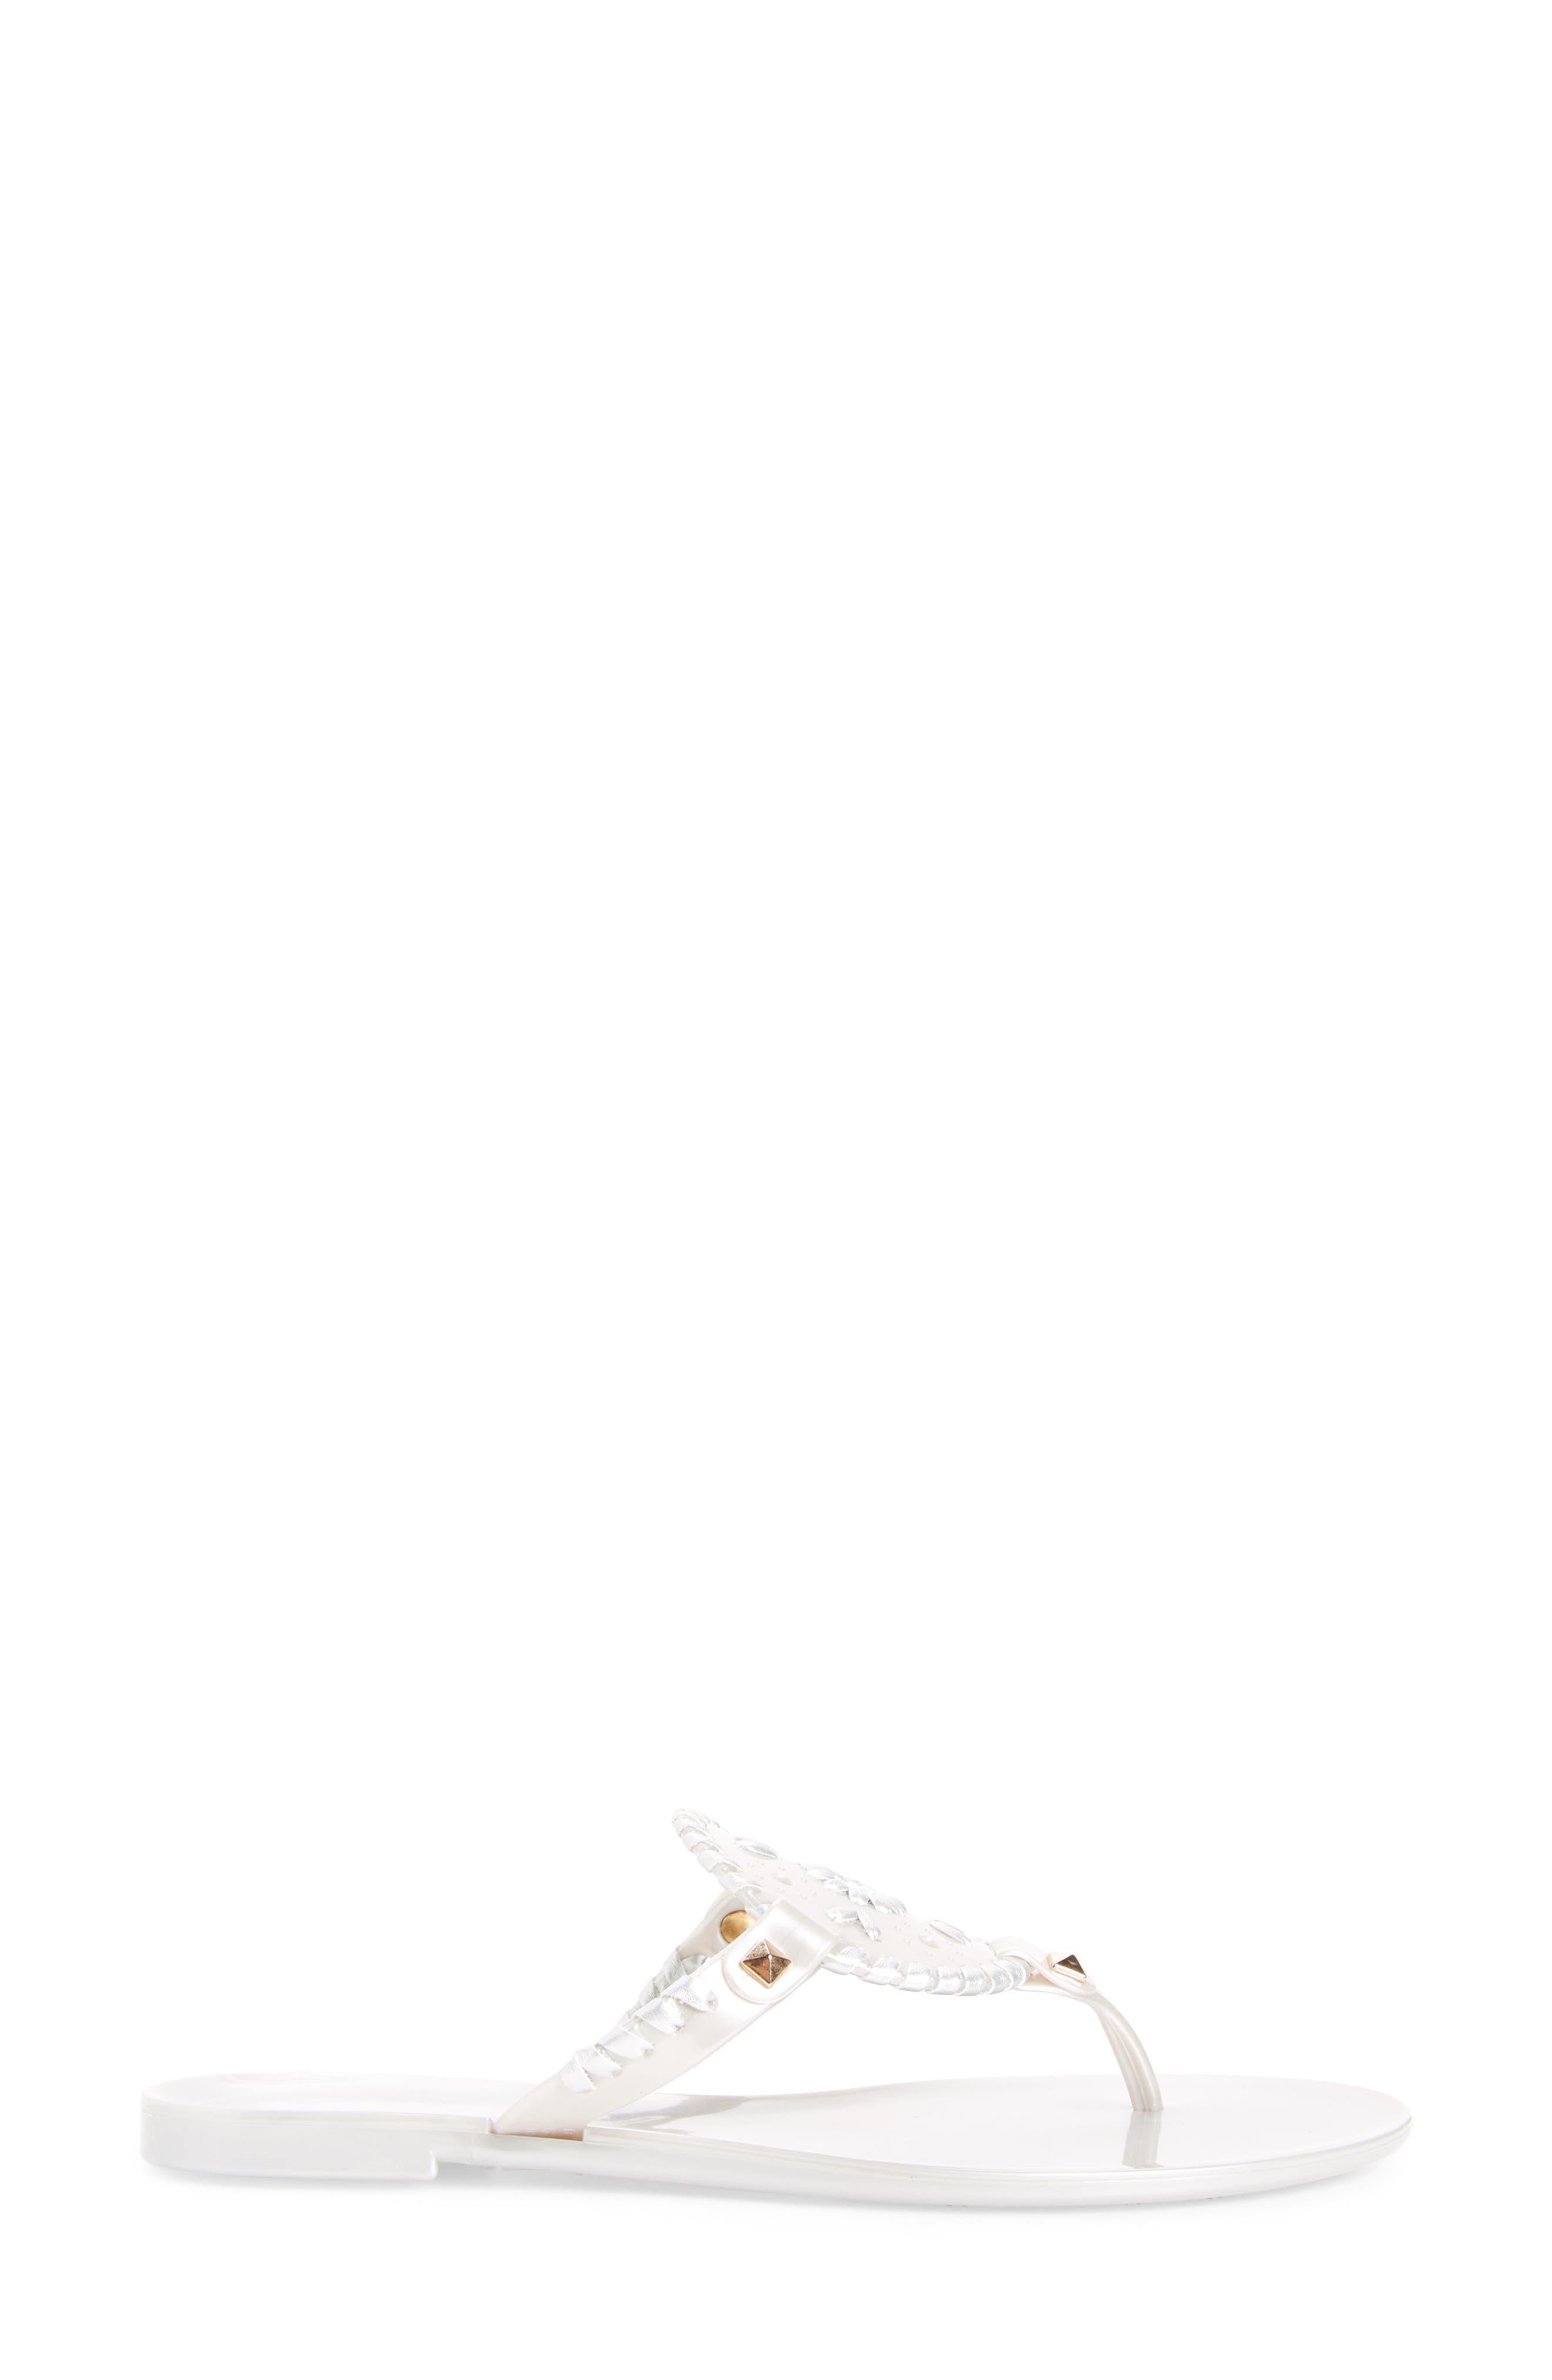 'Georgica' Jelly Flip Flop,                             Alternate thumbnail 85, color,